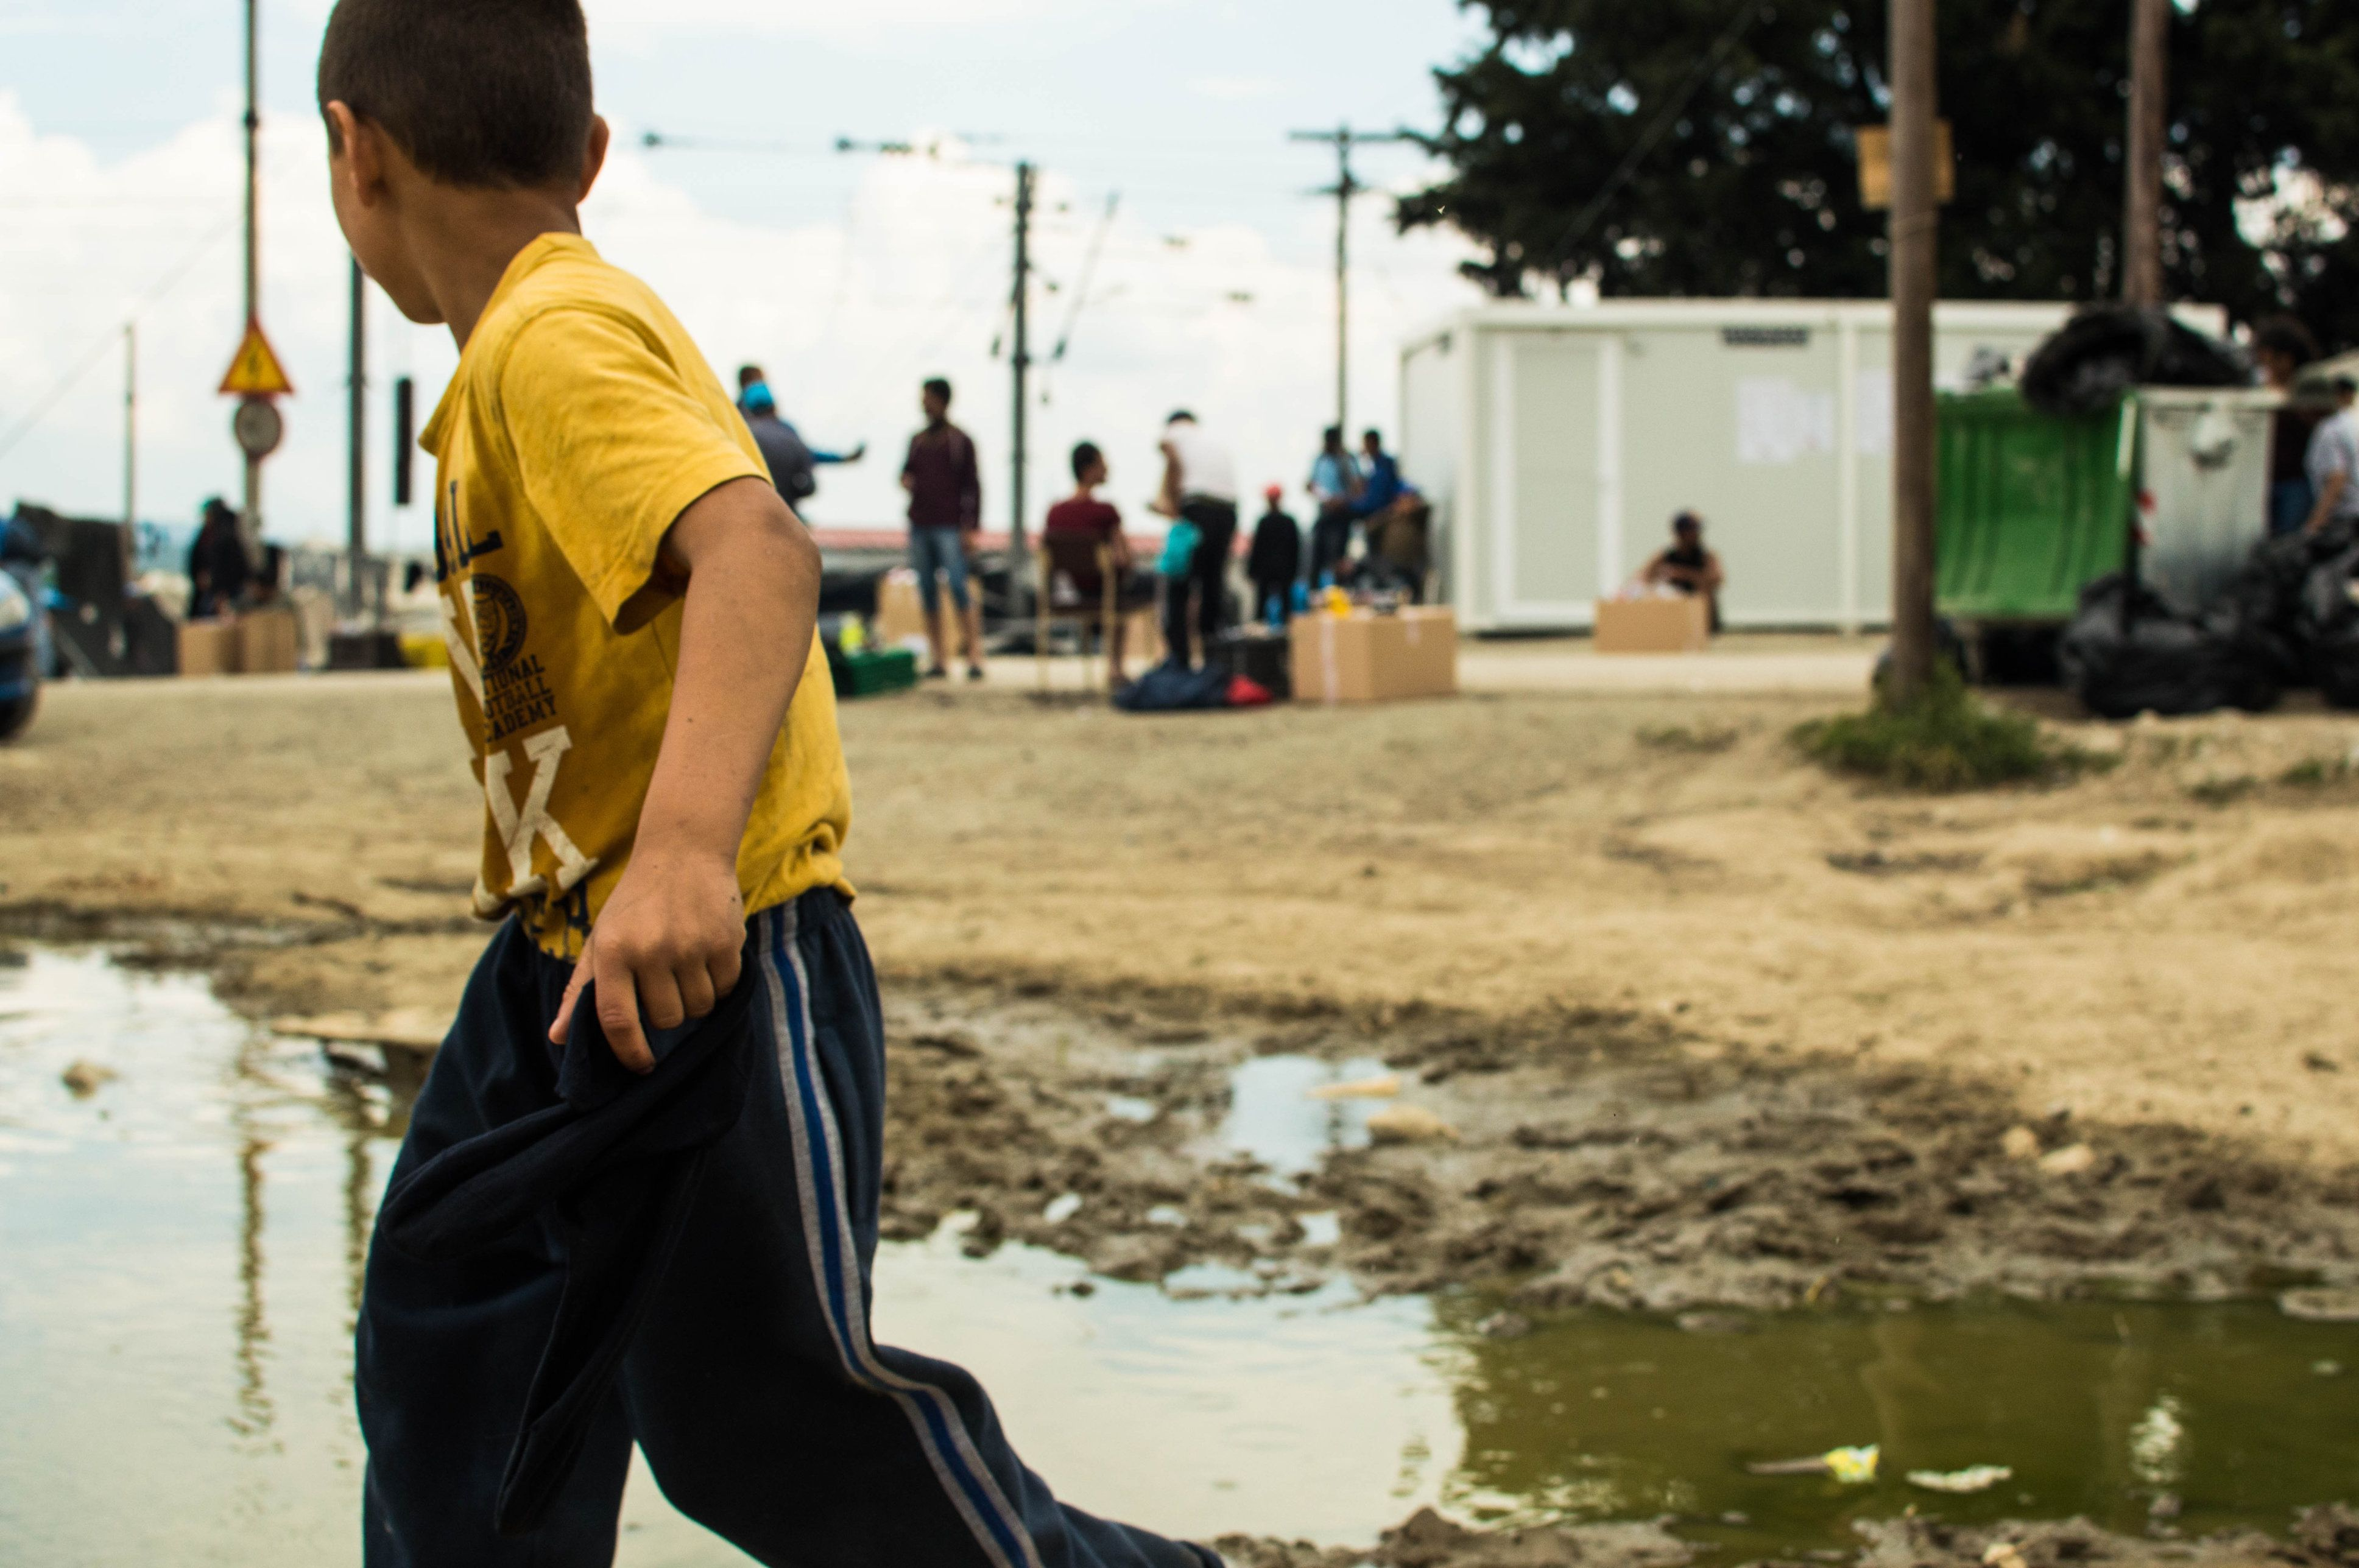 DW: Το Ευρωπαϊκό Δικαστήριο καταδικάζει την Ελλάδα για τη μεταχείριση ανήλικων